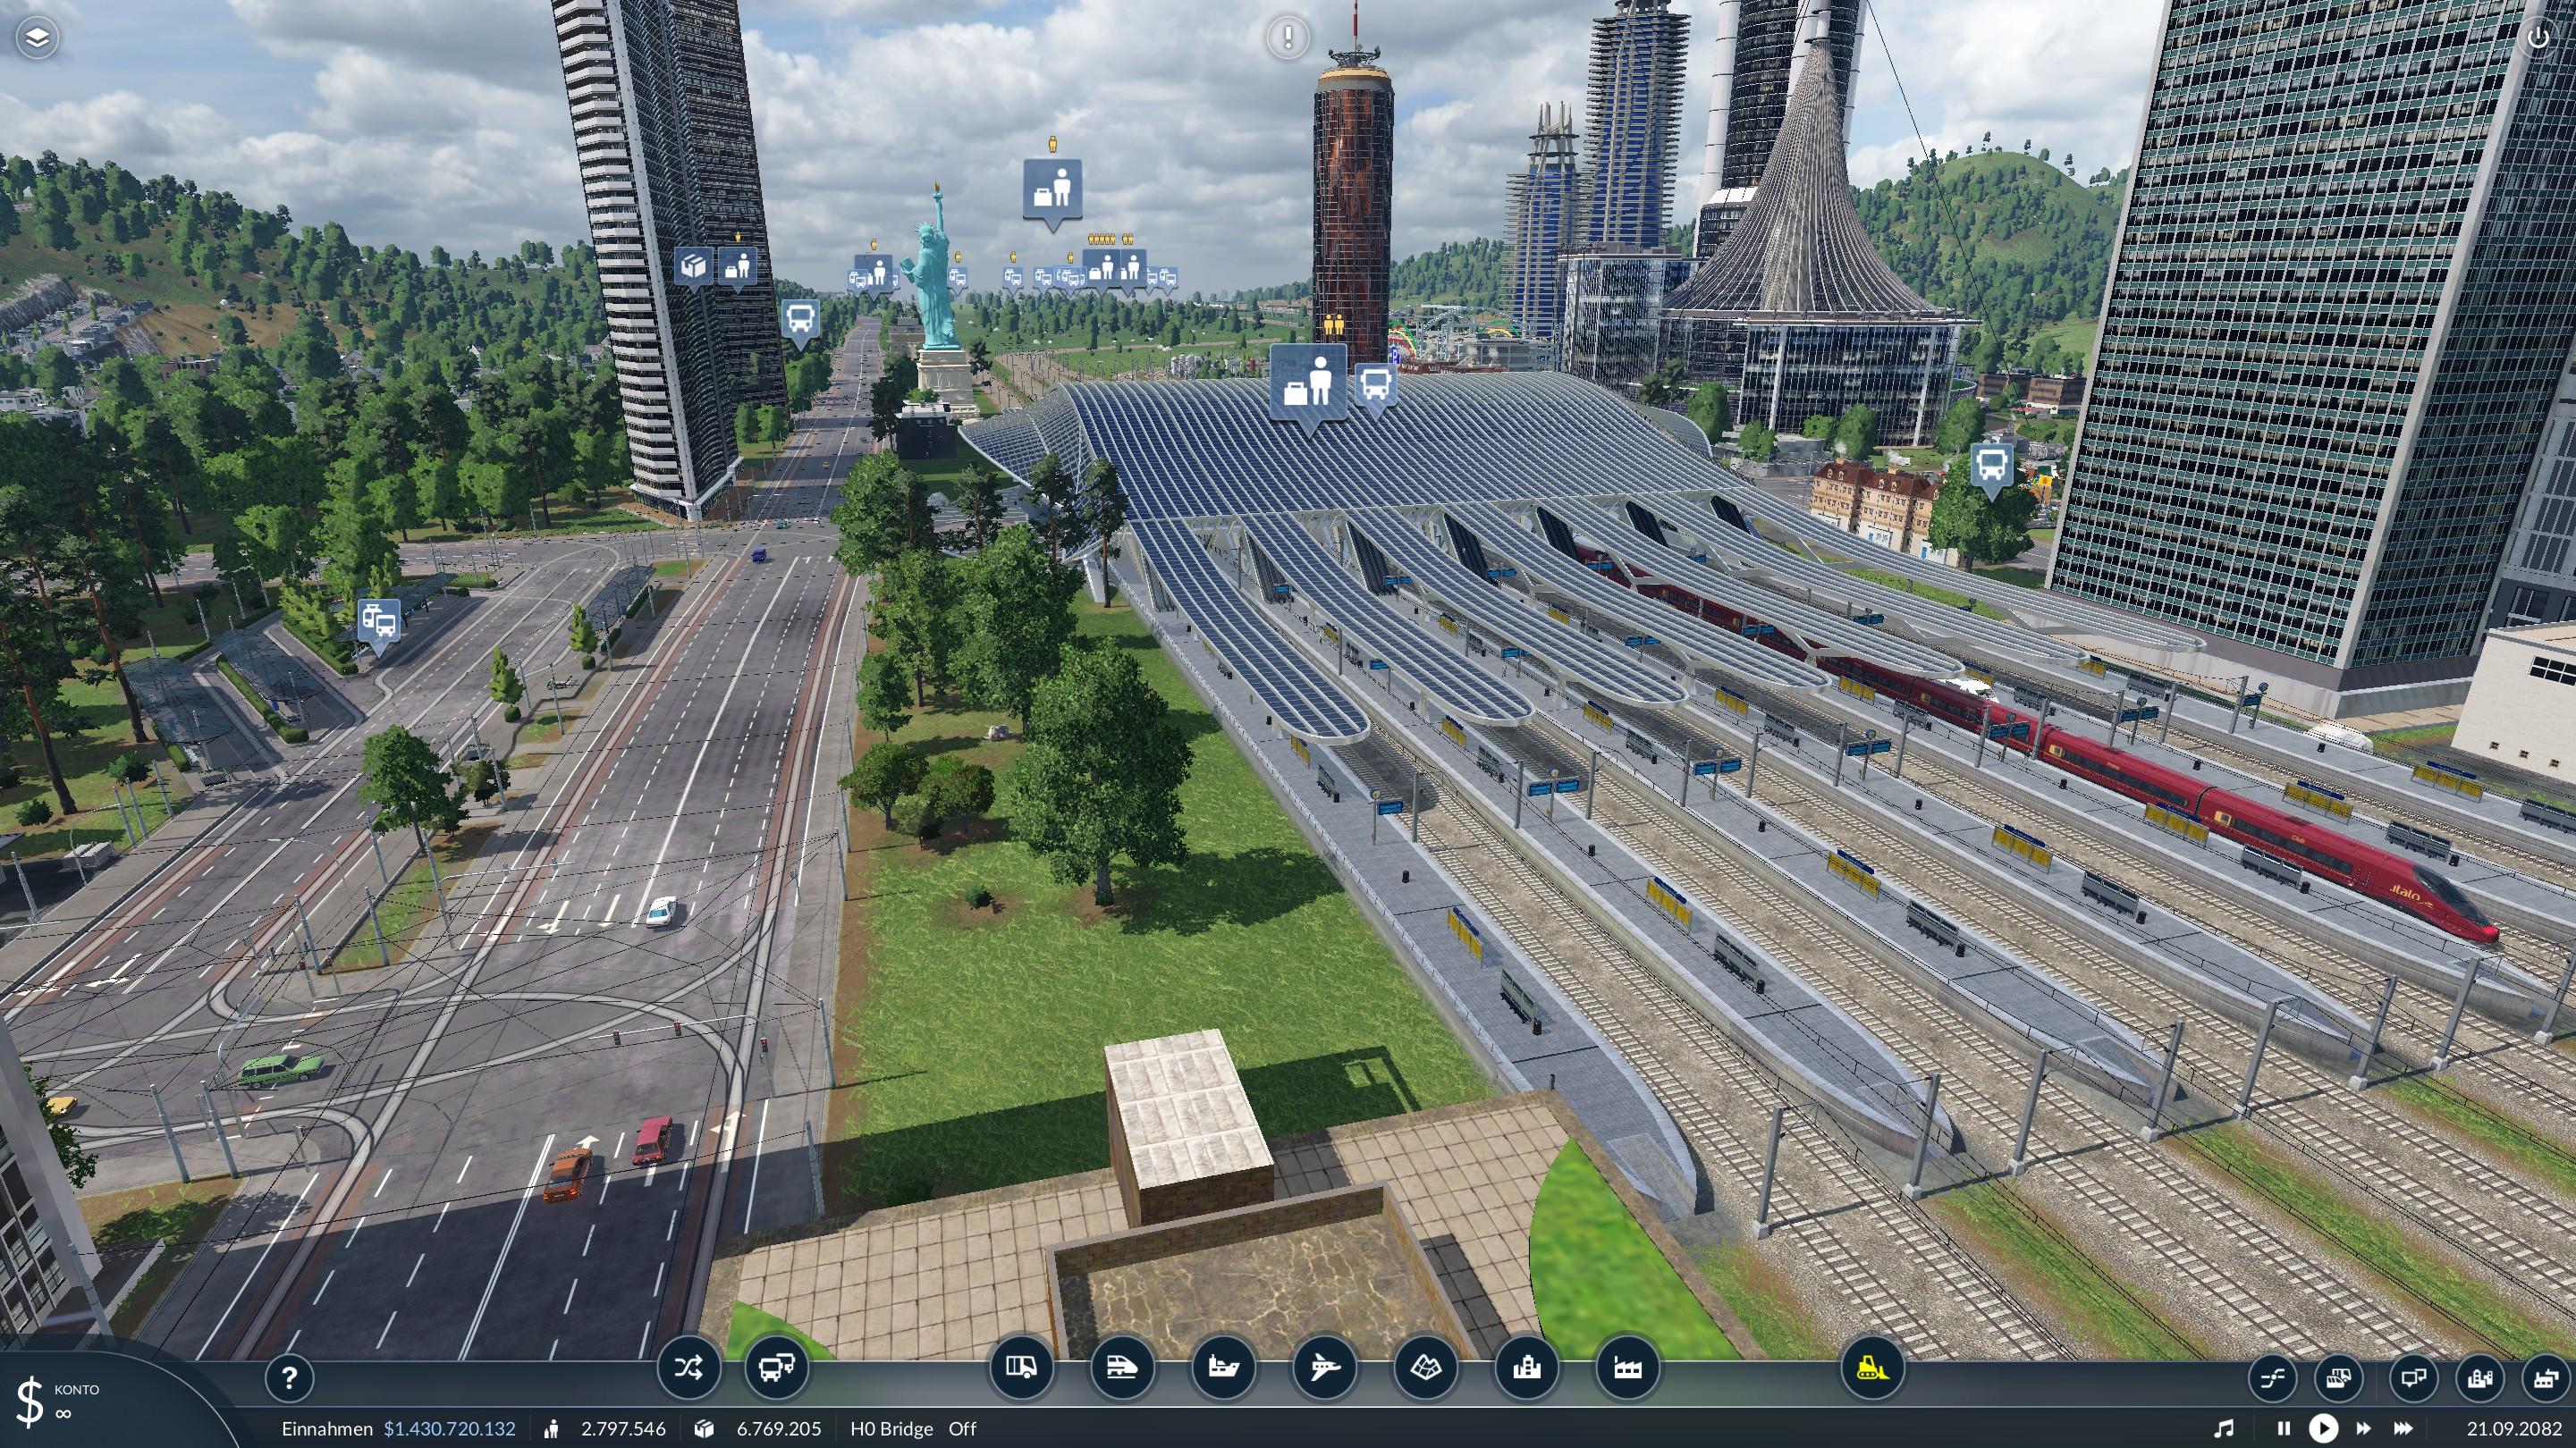 Transport Fever 2 - Liege-Guillemins Railway Station